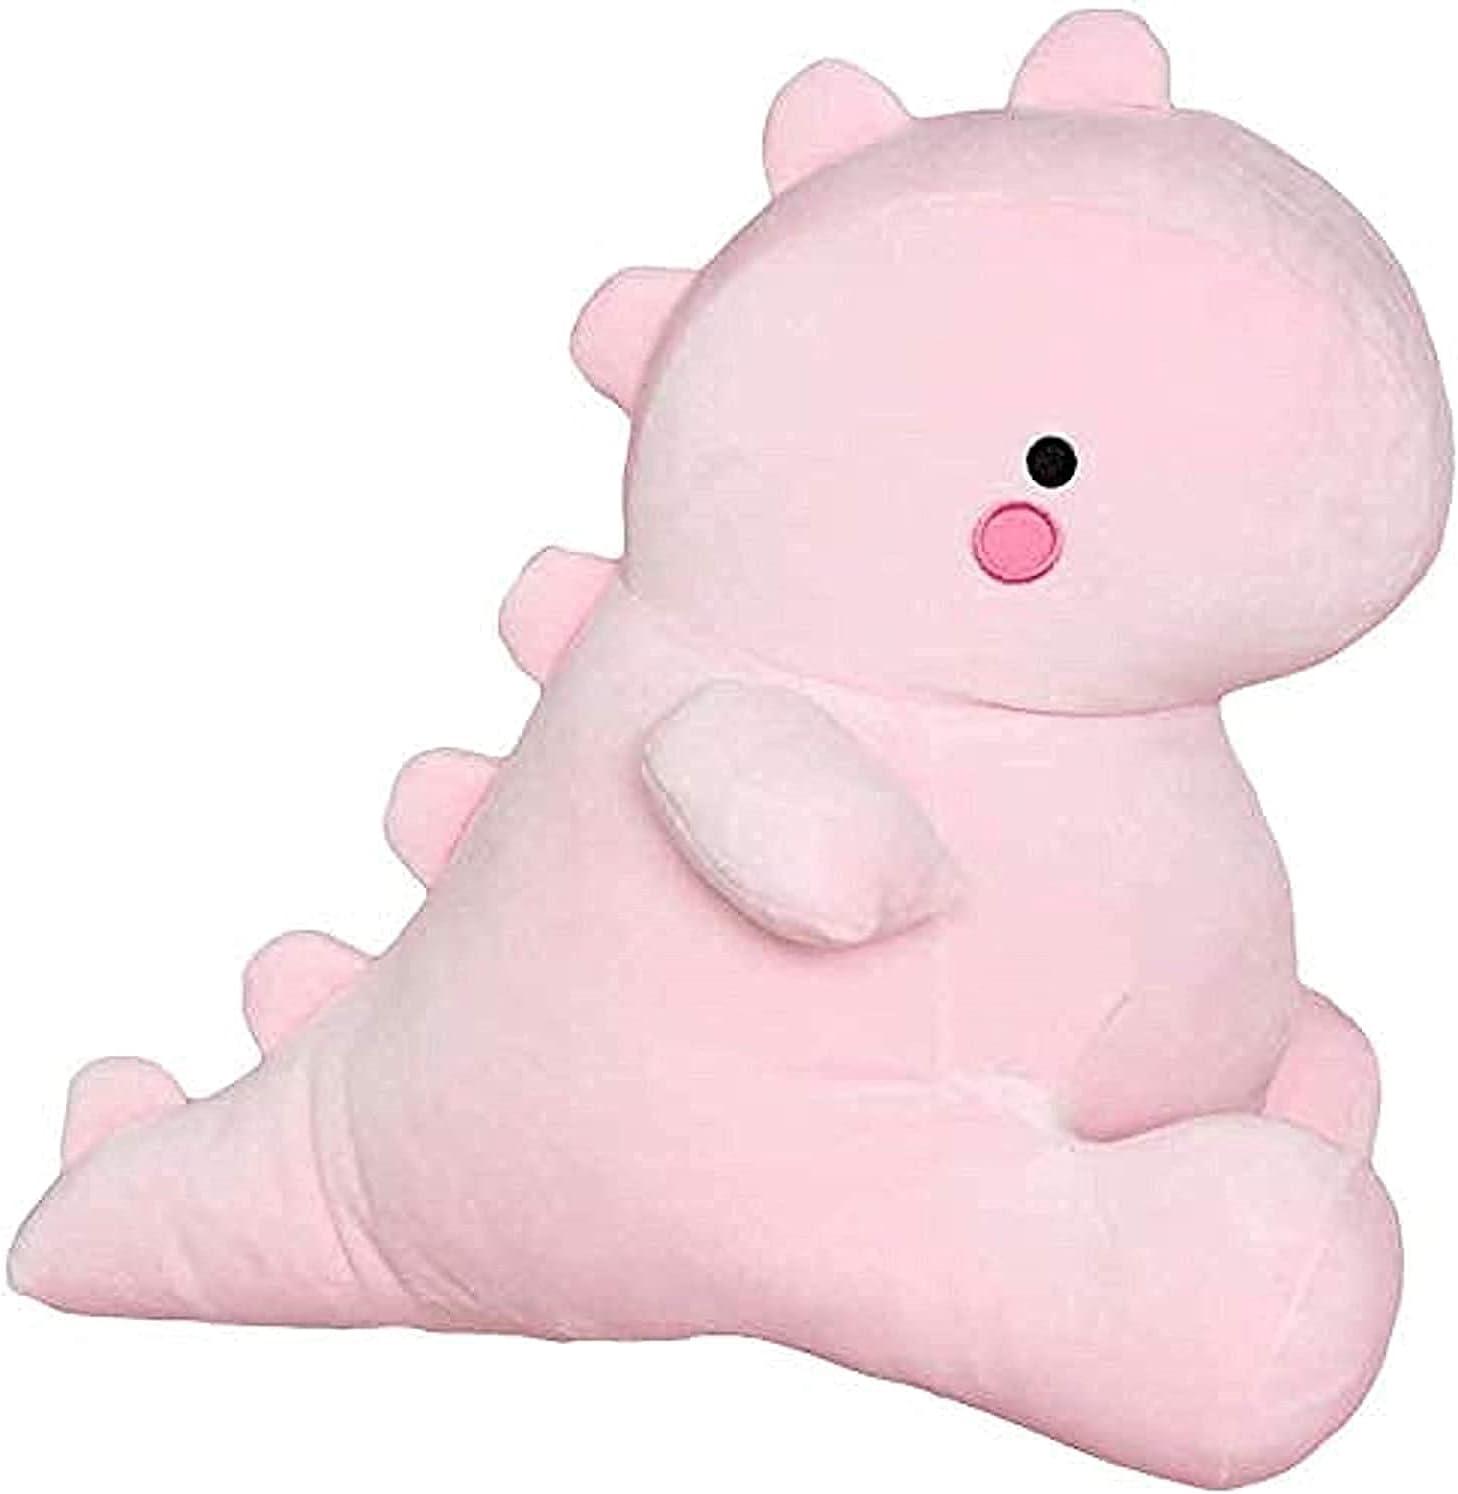 Cute Charming Cartoon Fashion Funny Pretty Dinosaur Stuffed Animals Shape Big Hugging Pillow Soft 3D Pom Plush Toy Doll Ultra Fabric Bed Rest Chair Bolster Nursery Decoration Gift for Kids (Pink)